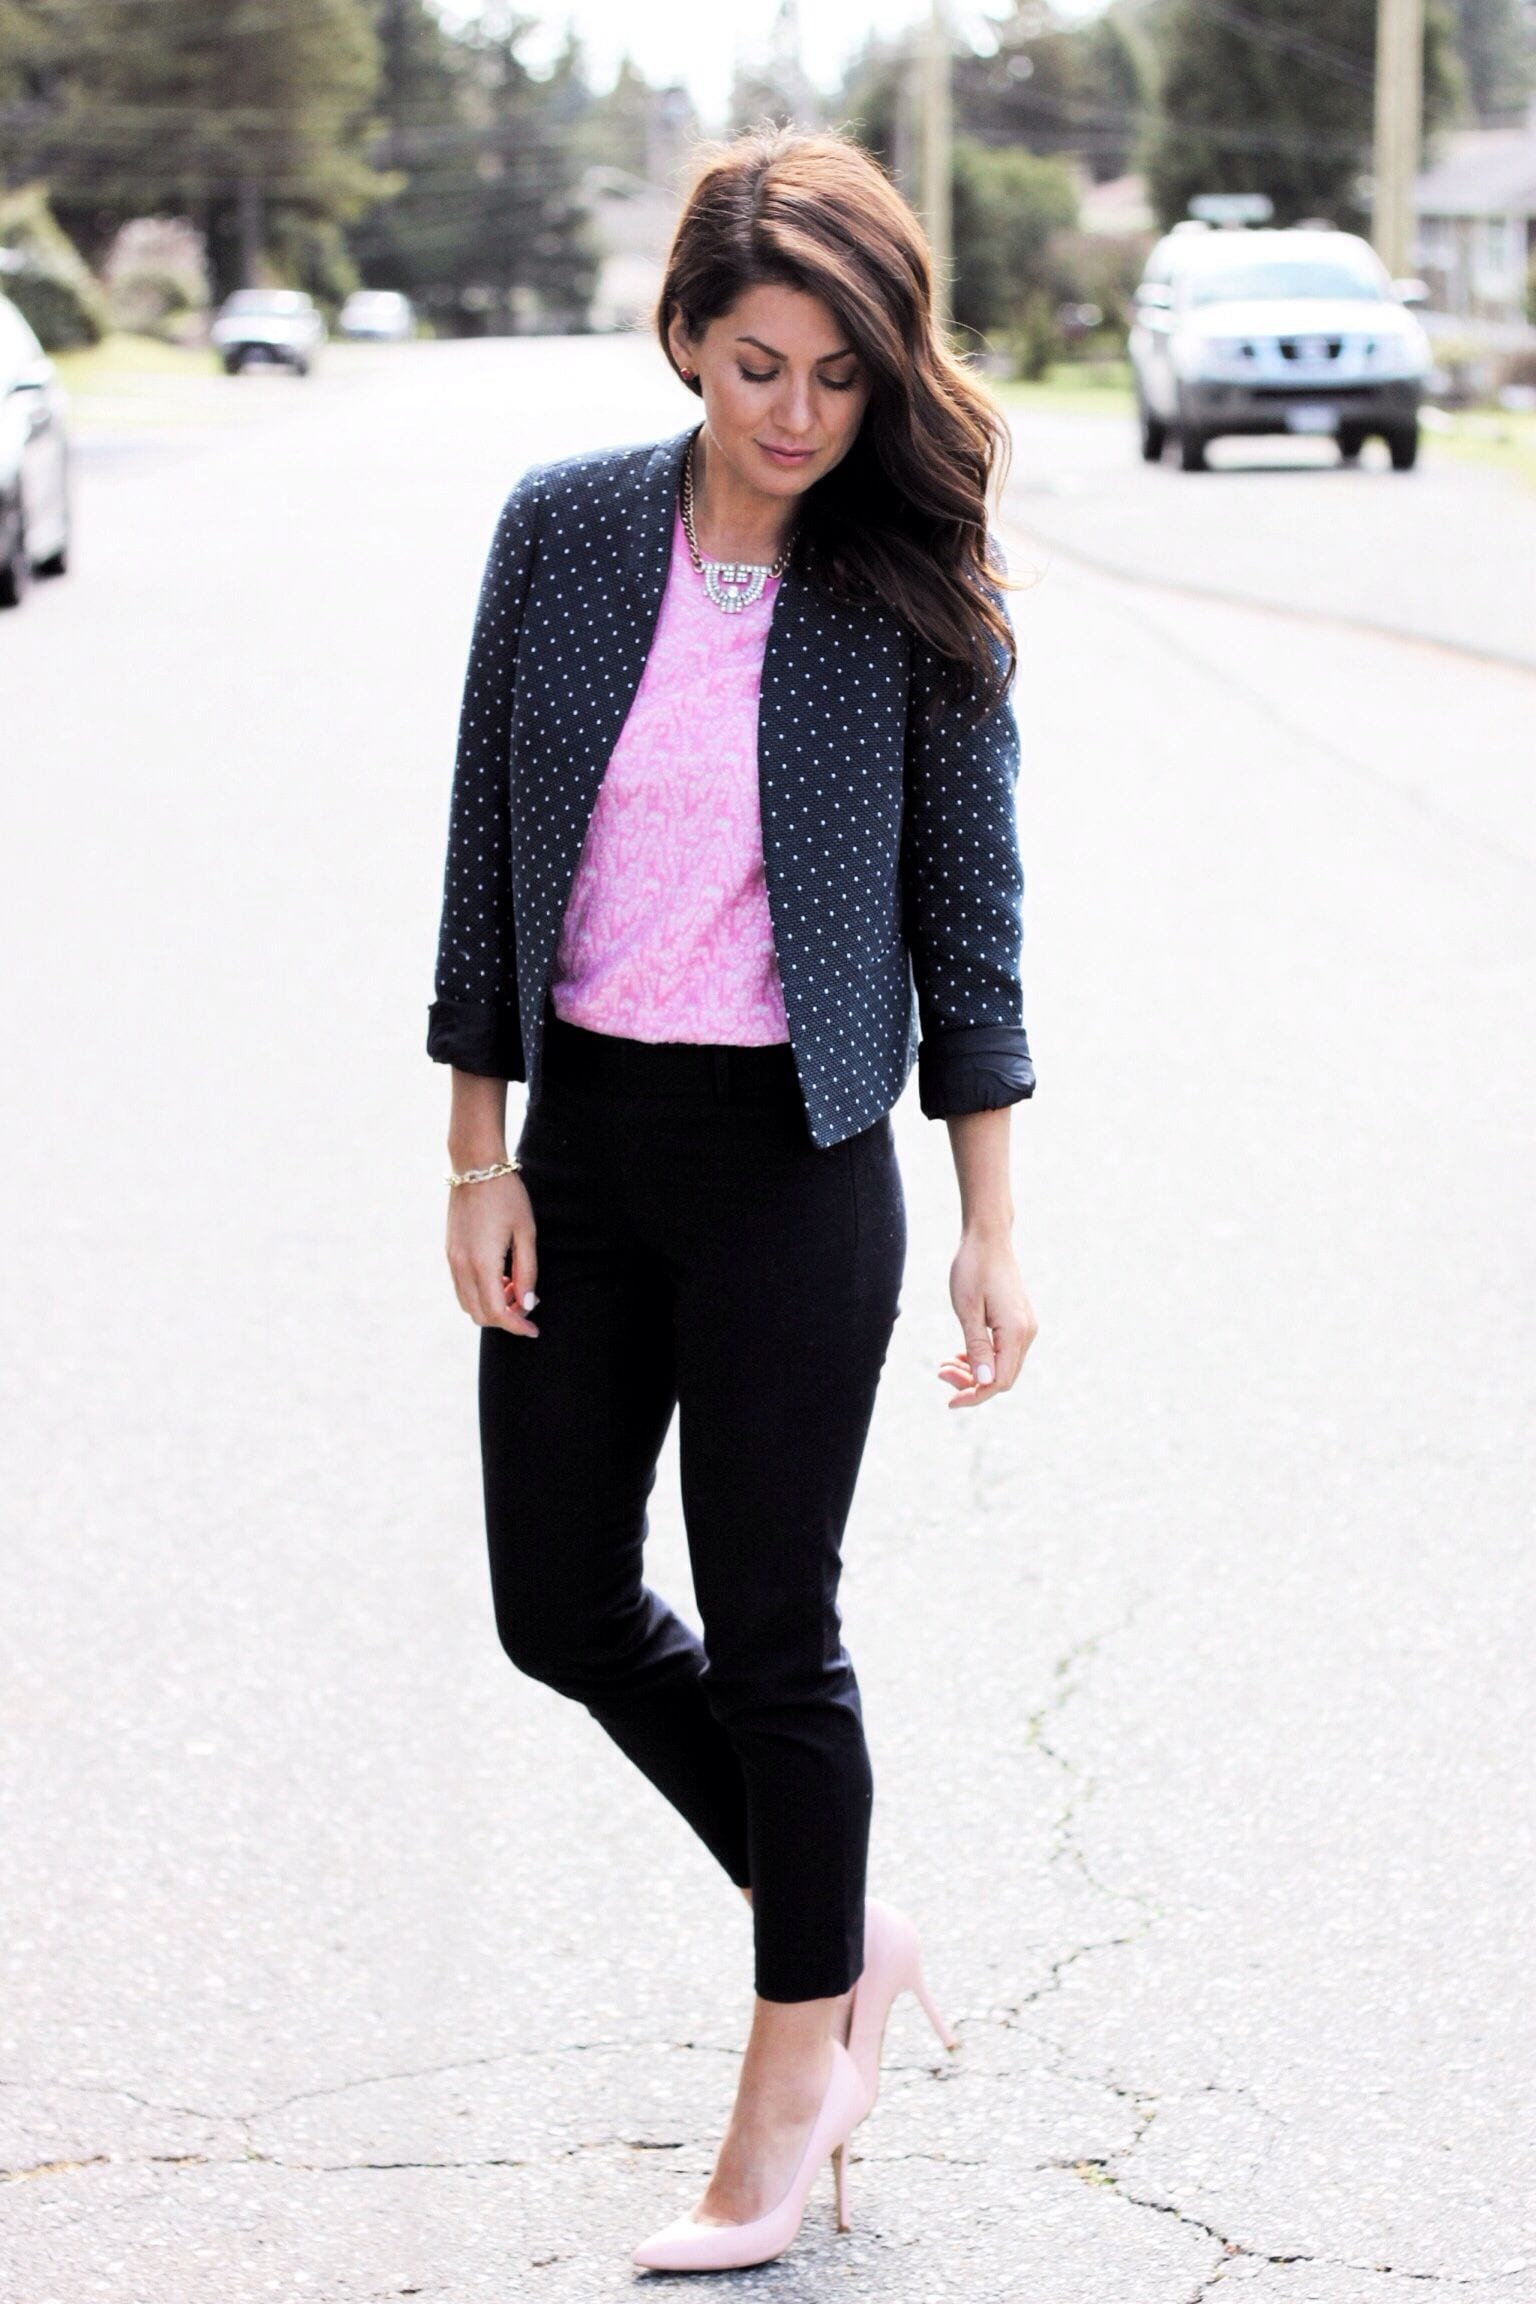 Black t shirt navy pants - Leopard Pants Grey T Shirt Black Blazer Black Heels Black Watch Navy Blazer Pink Top Black Dress Pants Pink Heels Necklace